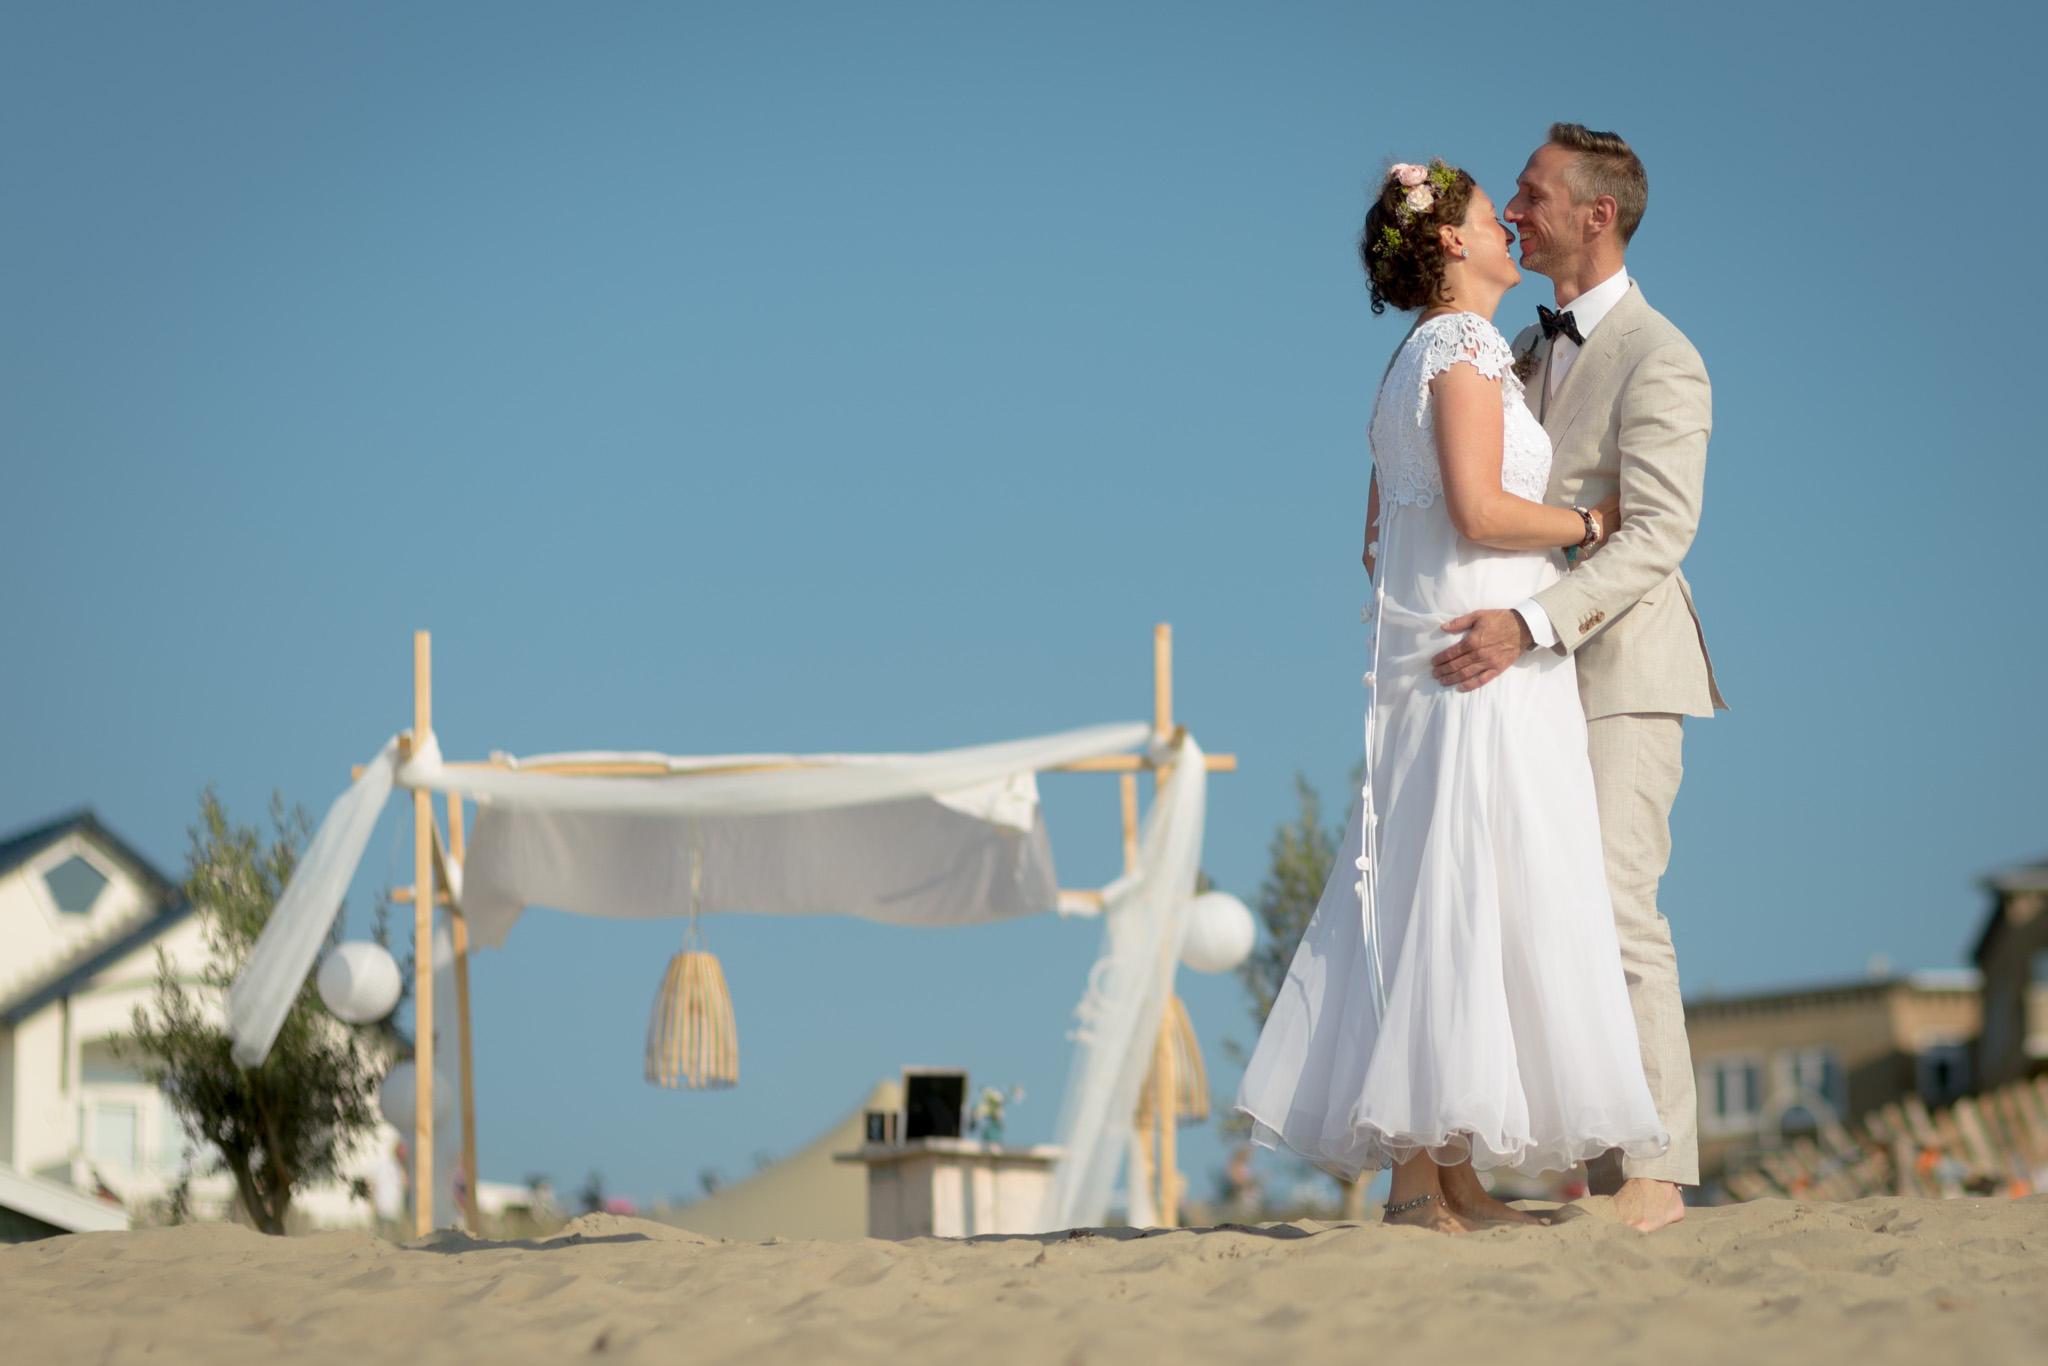 Bruidsfotograaf zandvoort